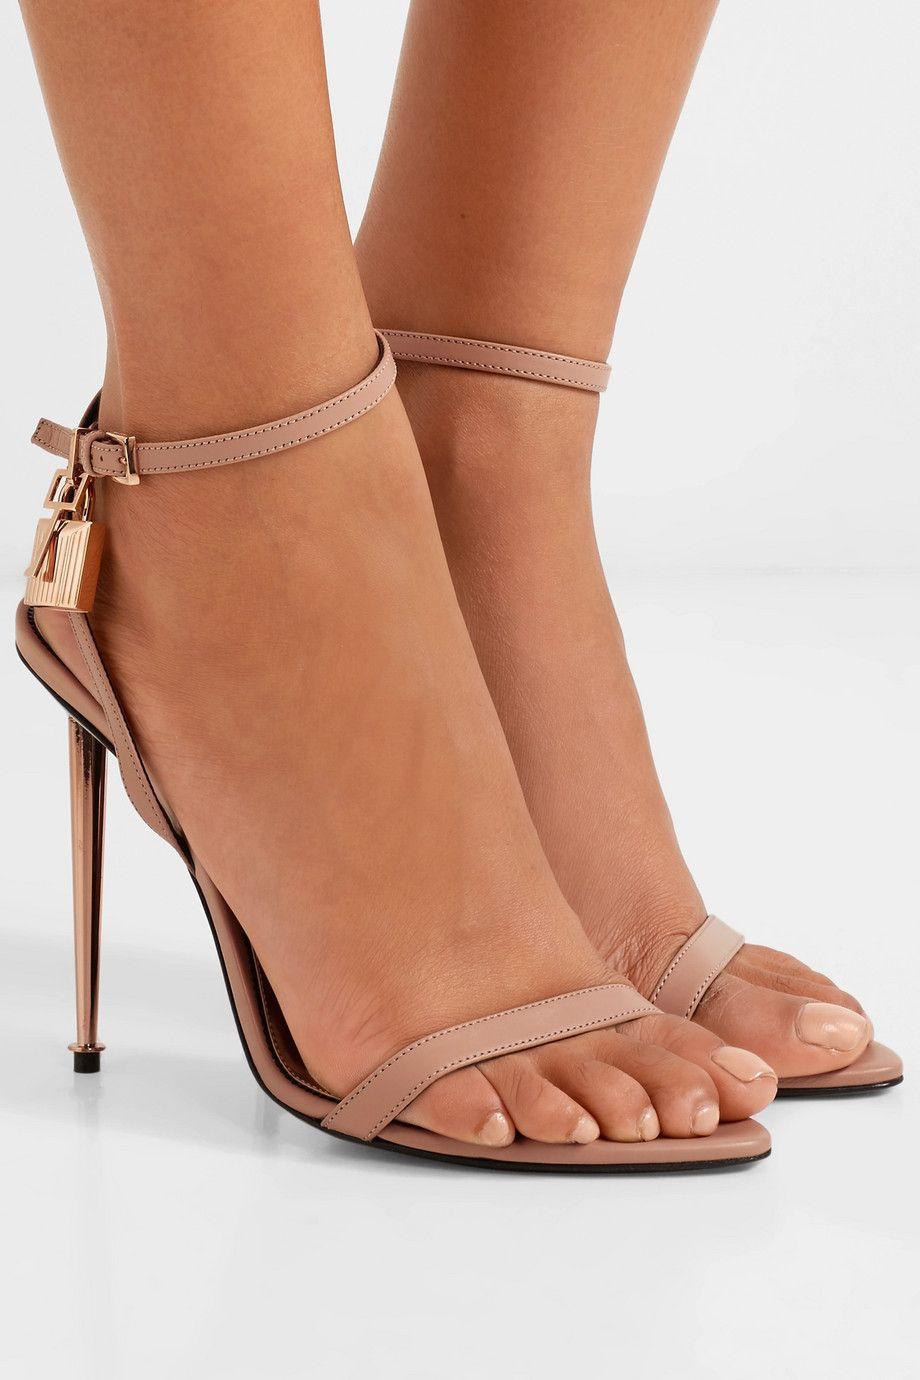 da557715f4 TOM FORD - Padlock leather sandals in 2019   I Love Net-a-Porter ...